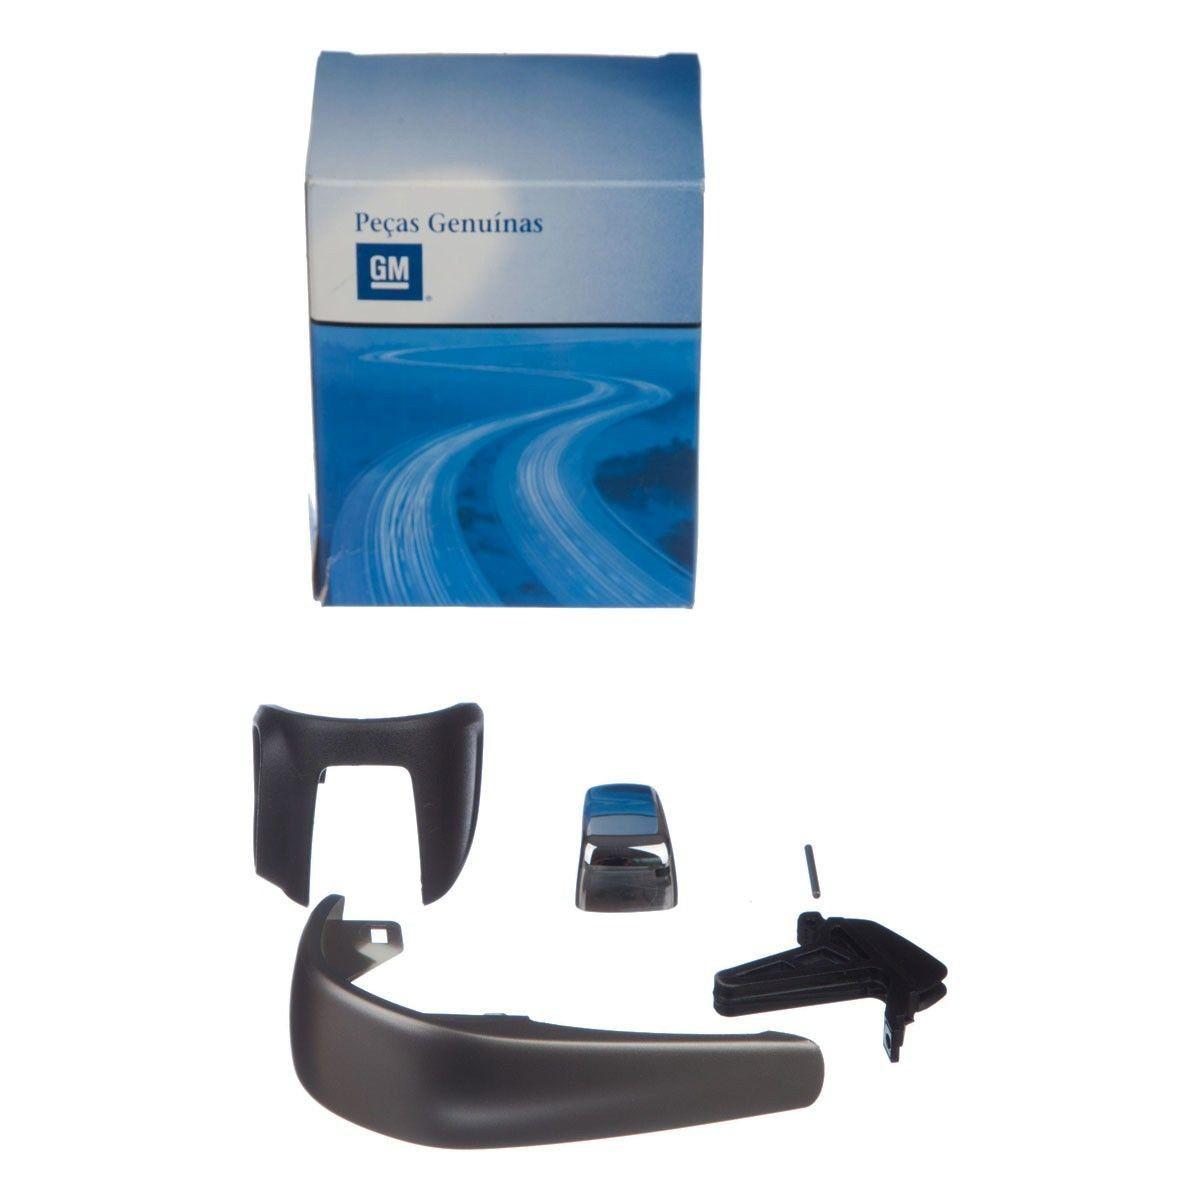 Kit reparo botoes alavanca cambio automatico - Cobalt Ate 2013 a 2016